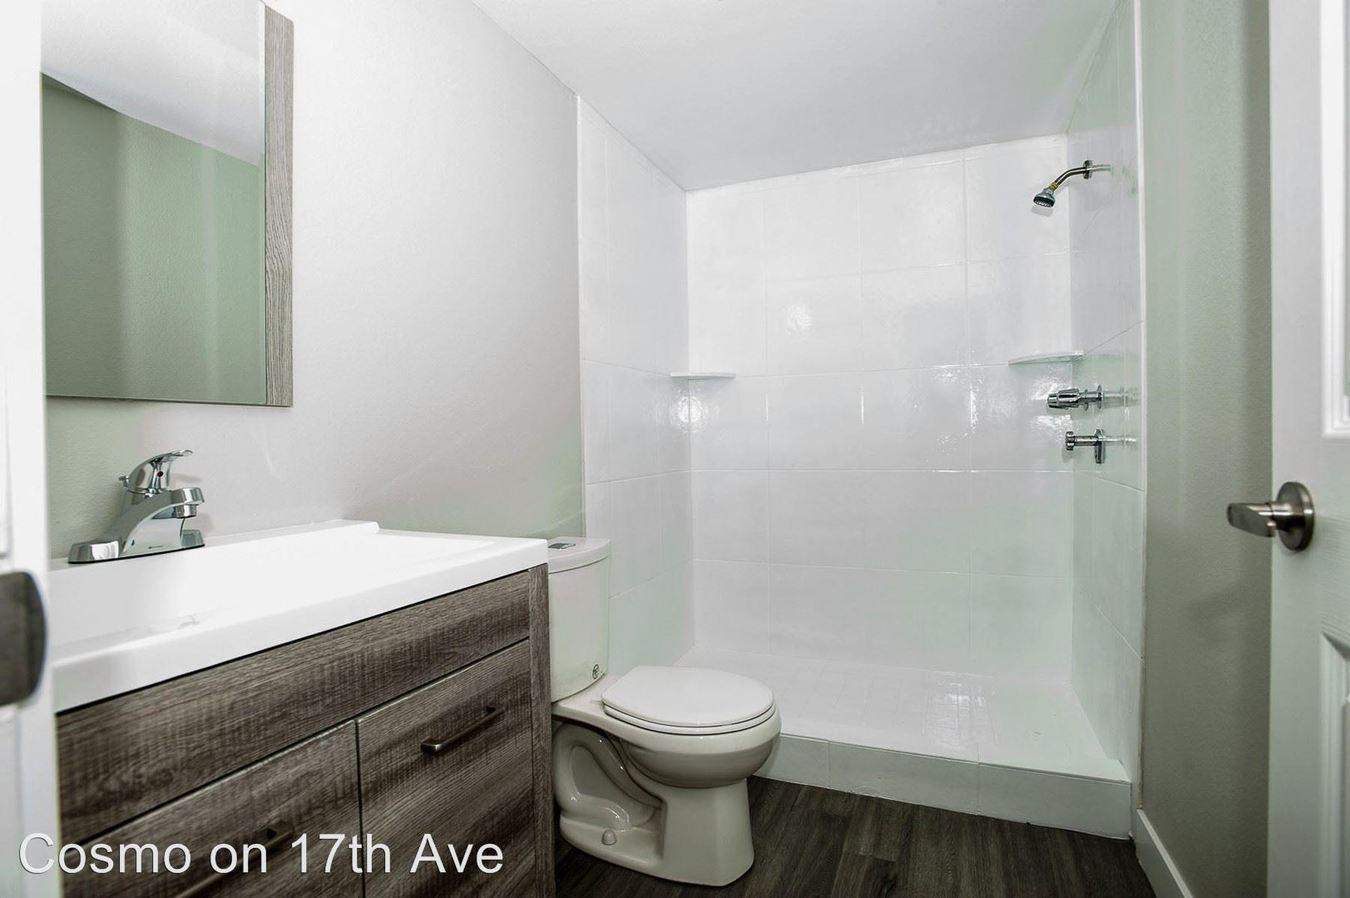 Fabulous 6542 N 17Th Ave Phoenix Az Apartment For Rent Interior Design Ideas Grebswwsoteloinfo